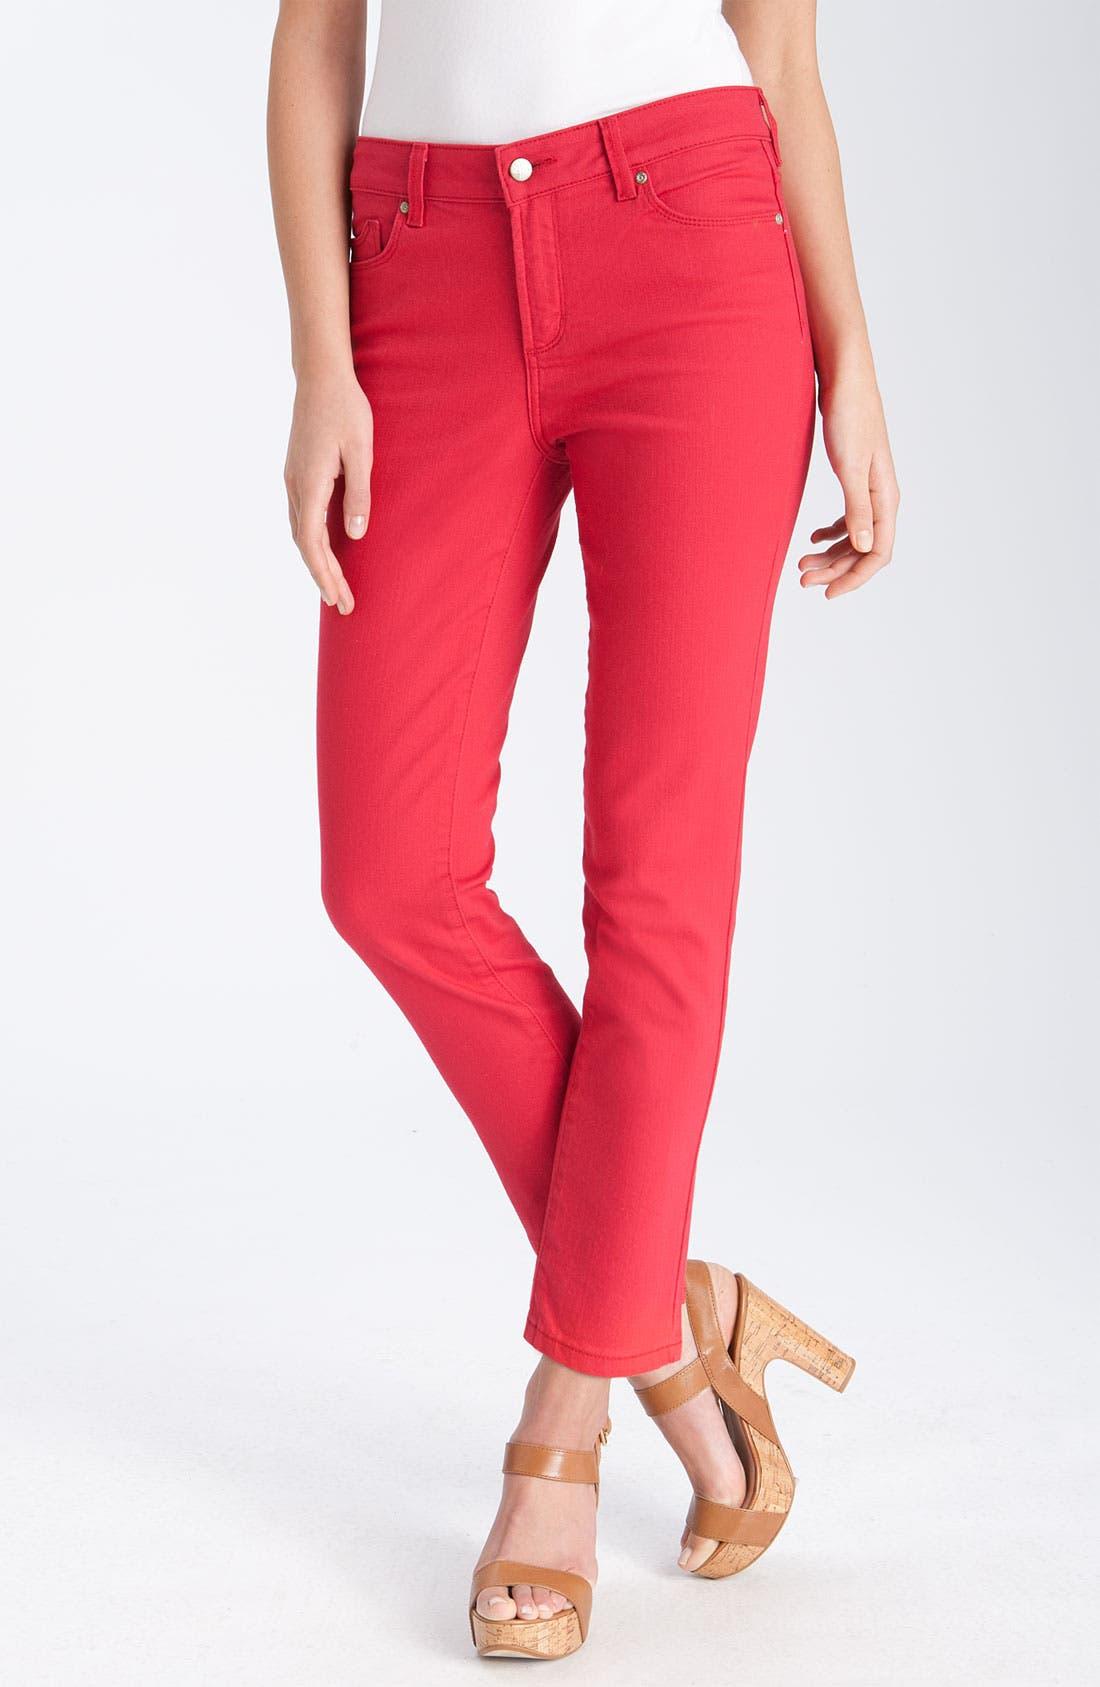 Main Image - NYDJ 'Alisha' Skinny Stretch Jeans (Petite)